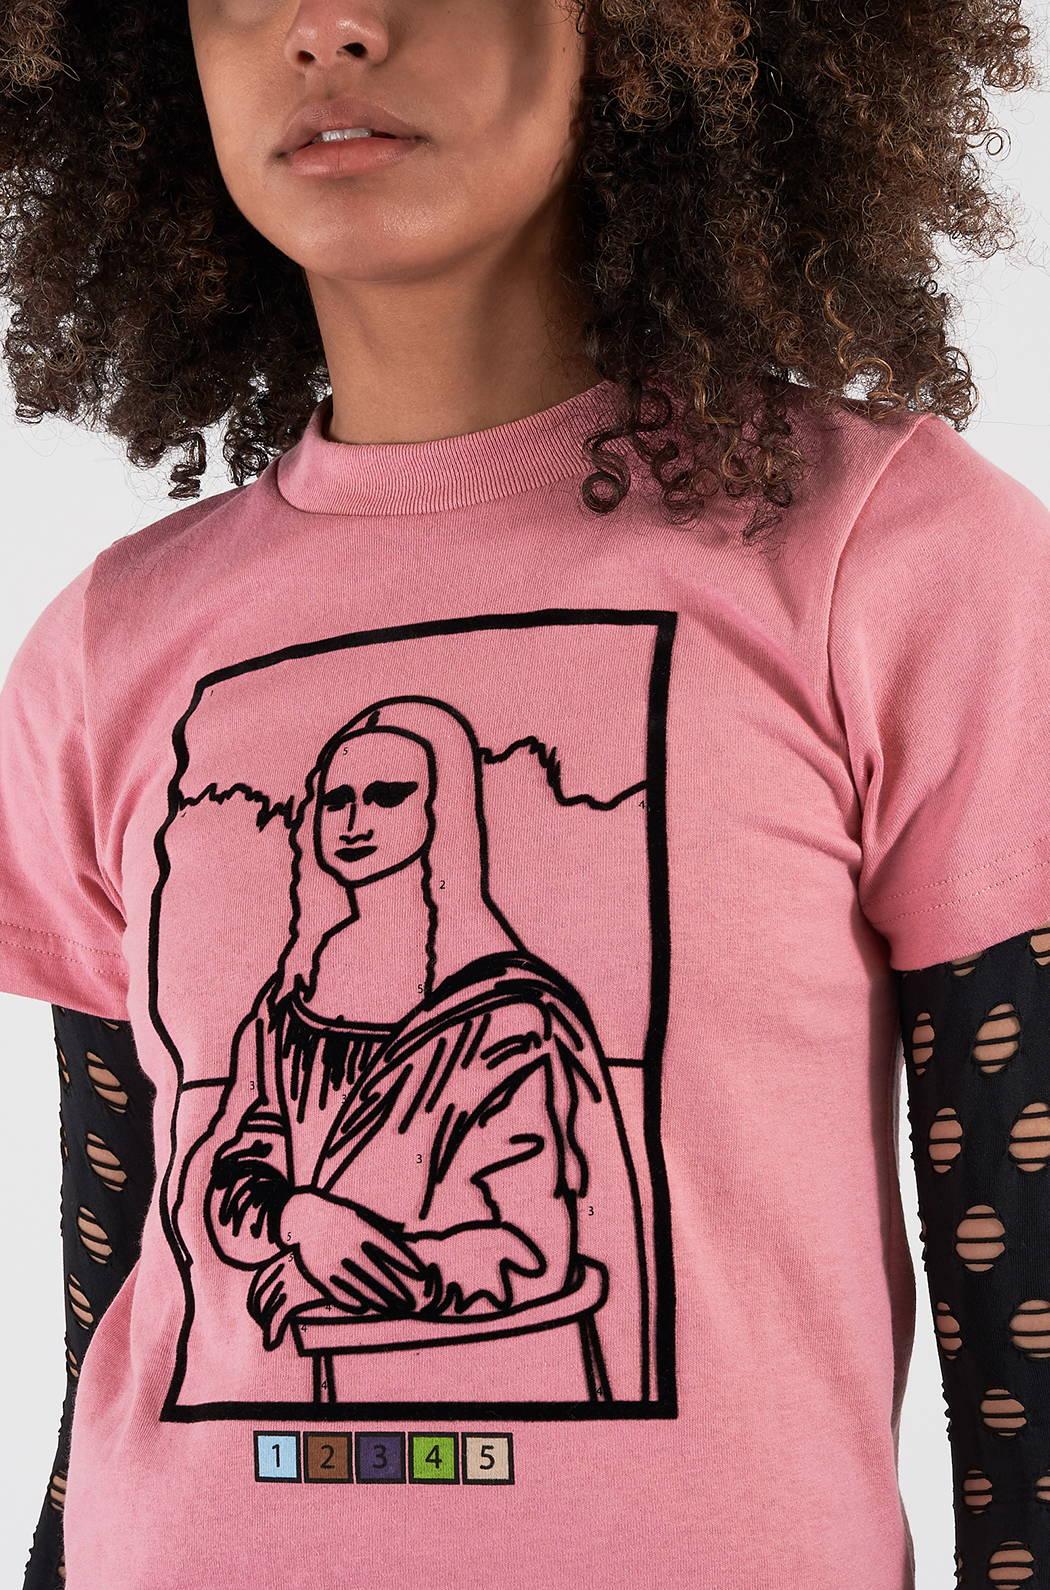 Shop the Maisie Wilen Mona Lisa T-Shirt